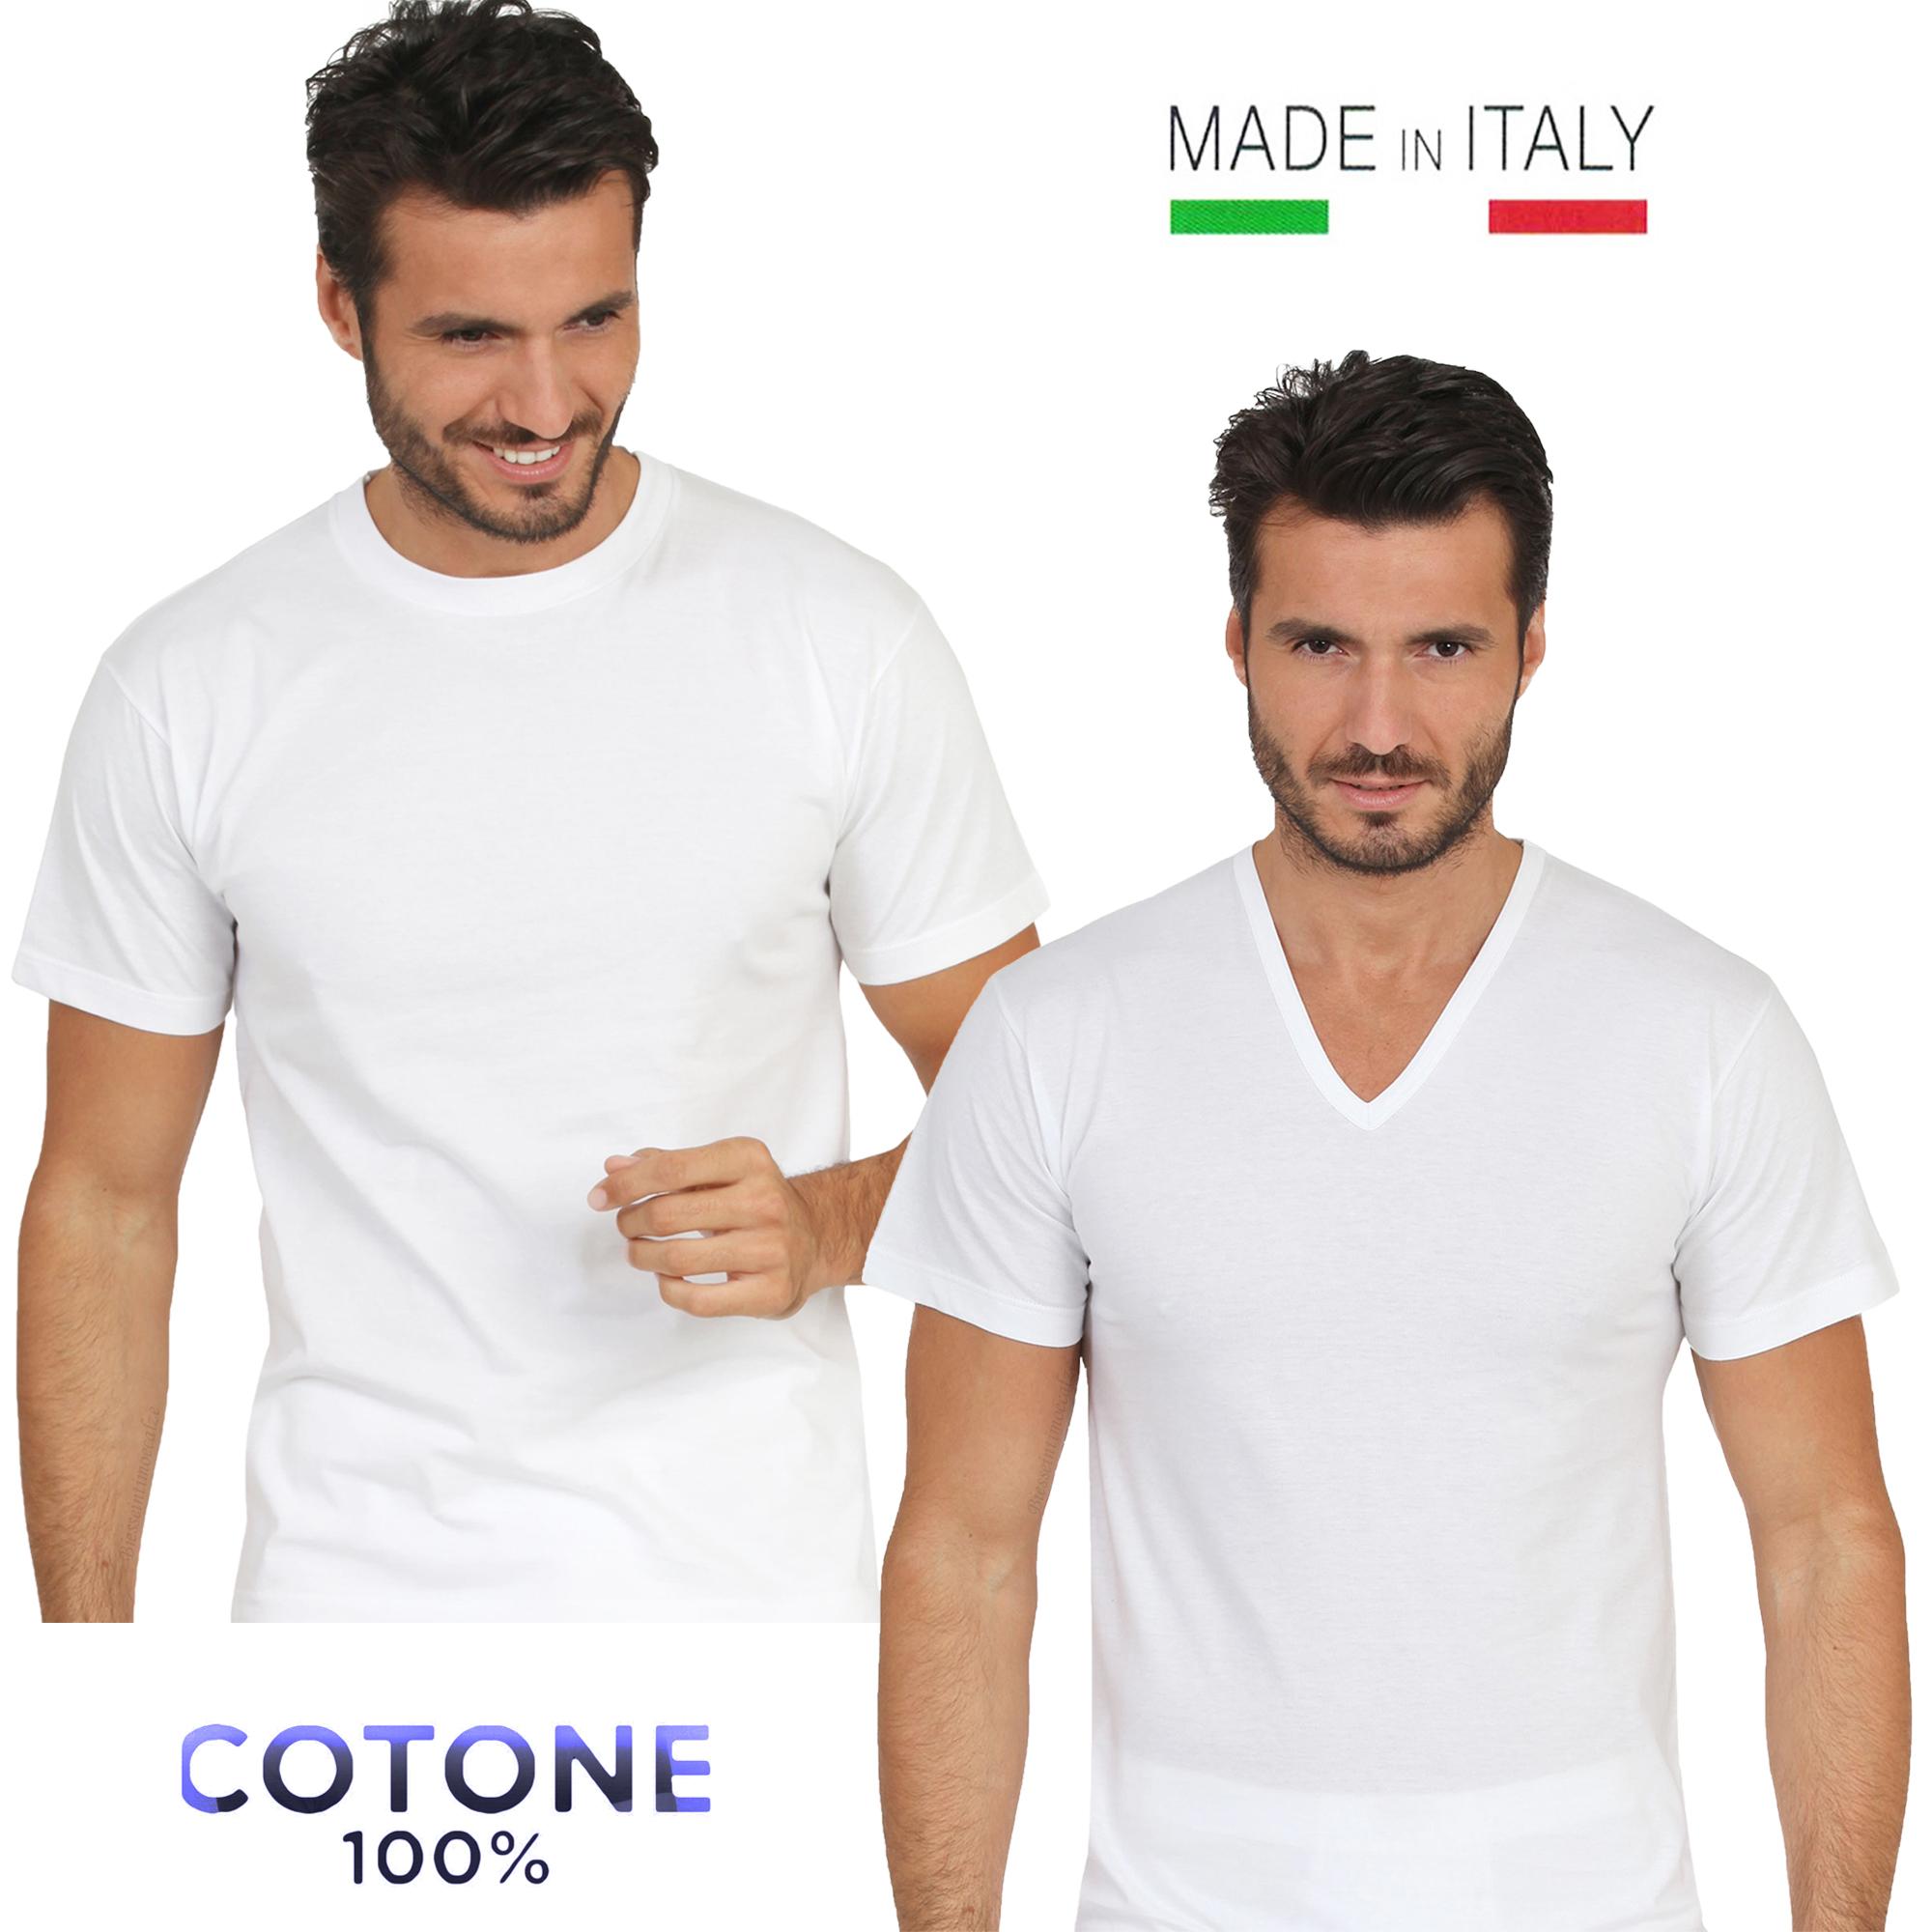 Pacco da 3 Hanes T-Shirt Uomo